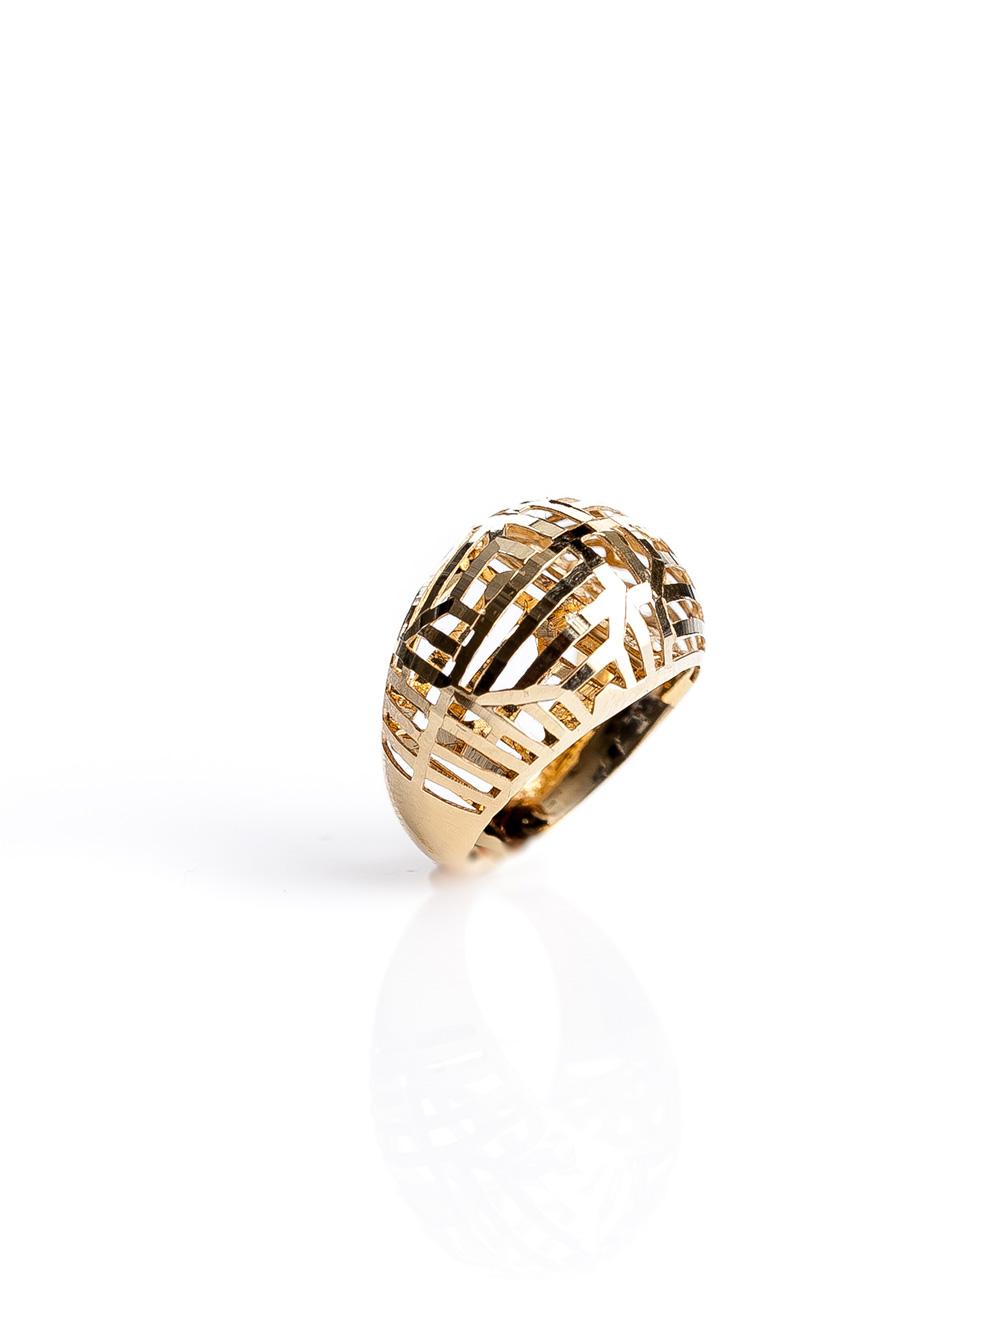 Anel abaolado, confeccionado em ouro 18k